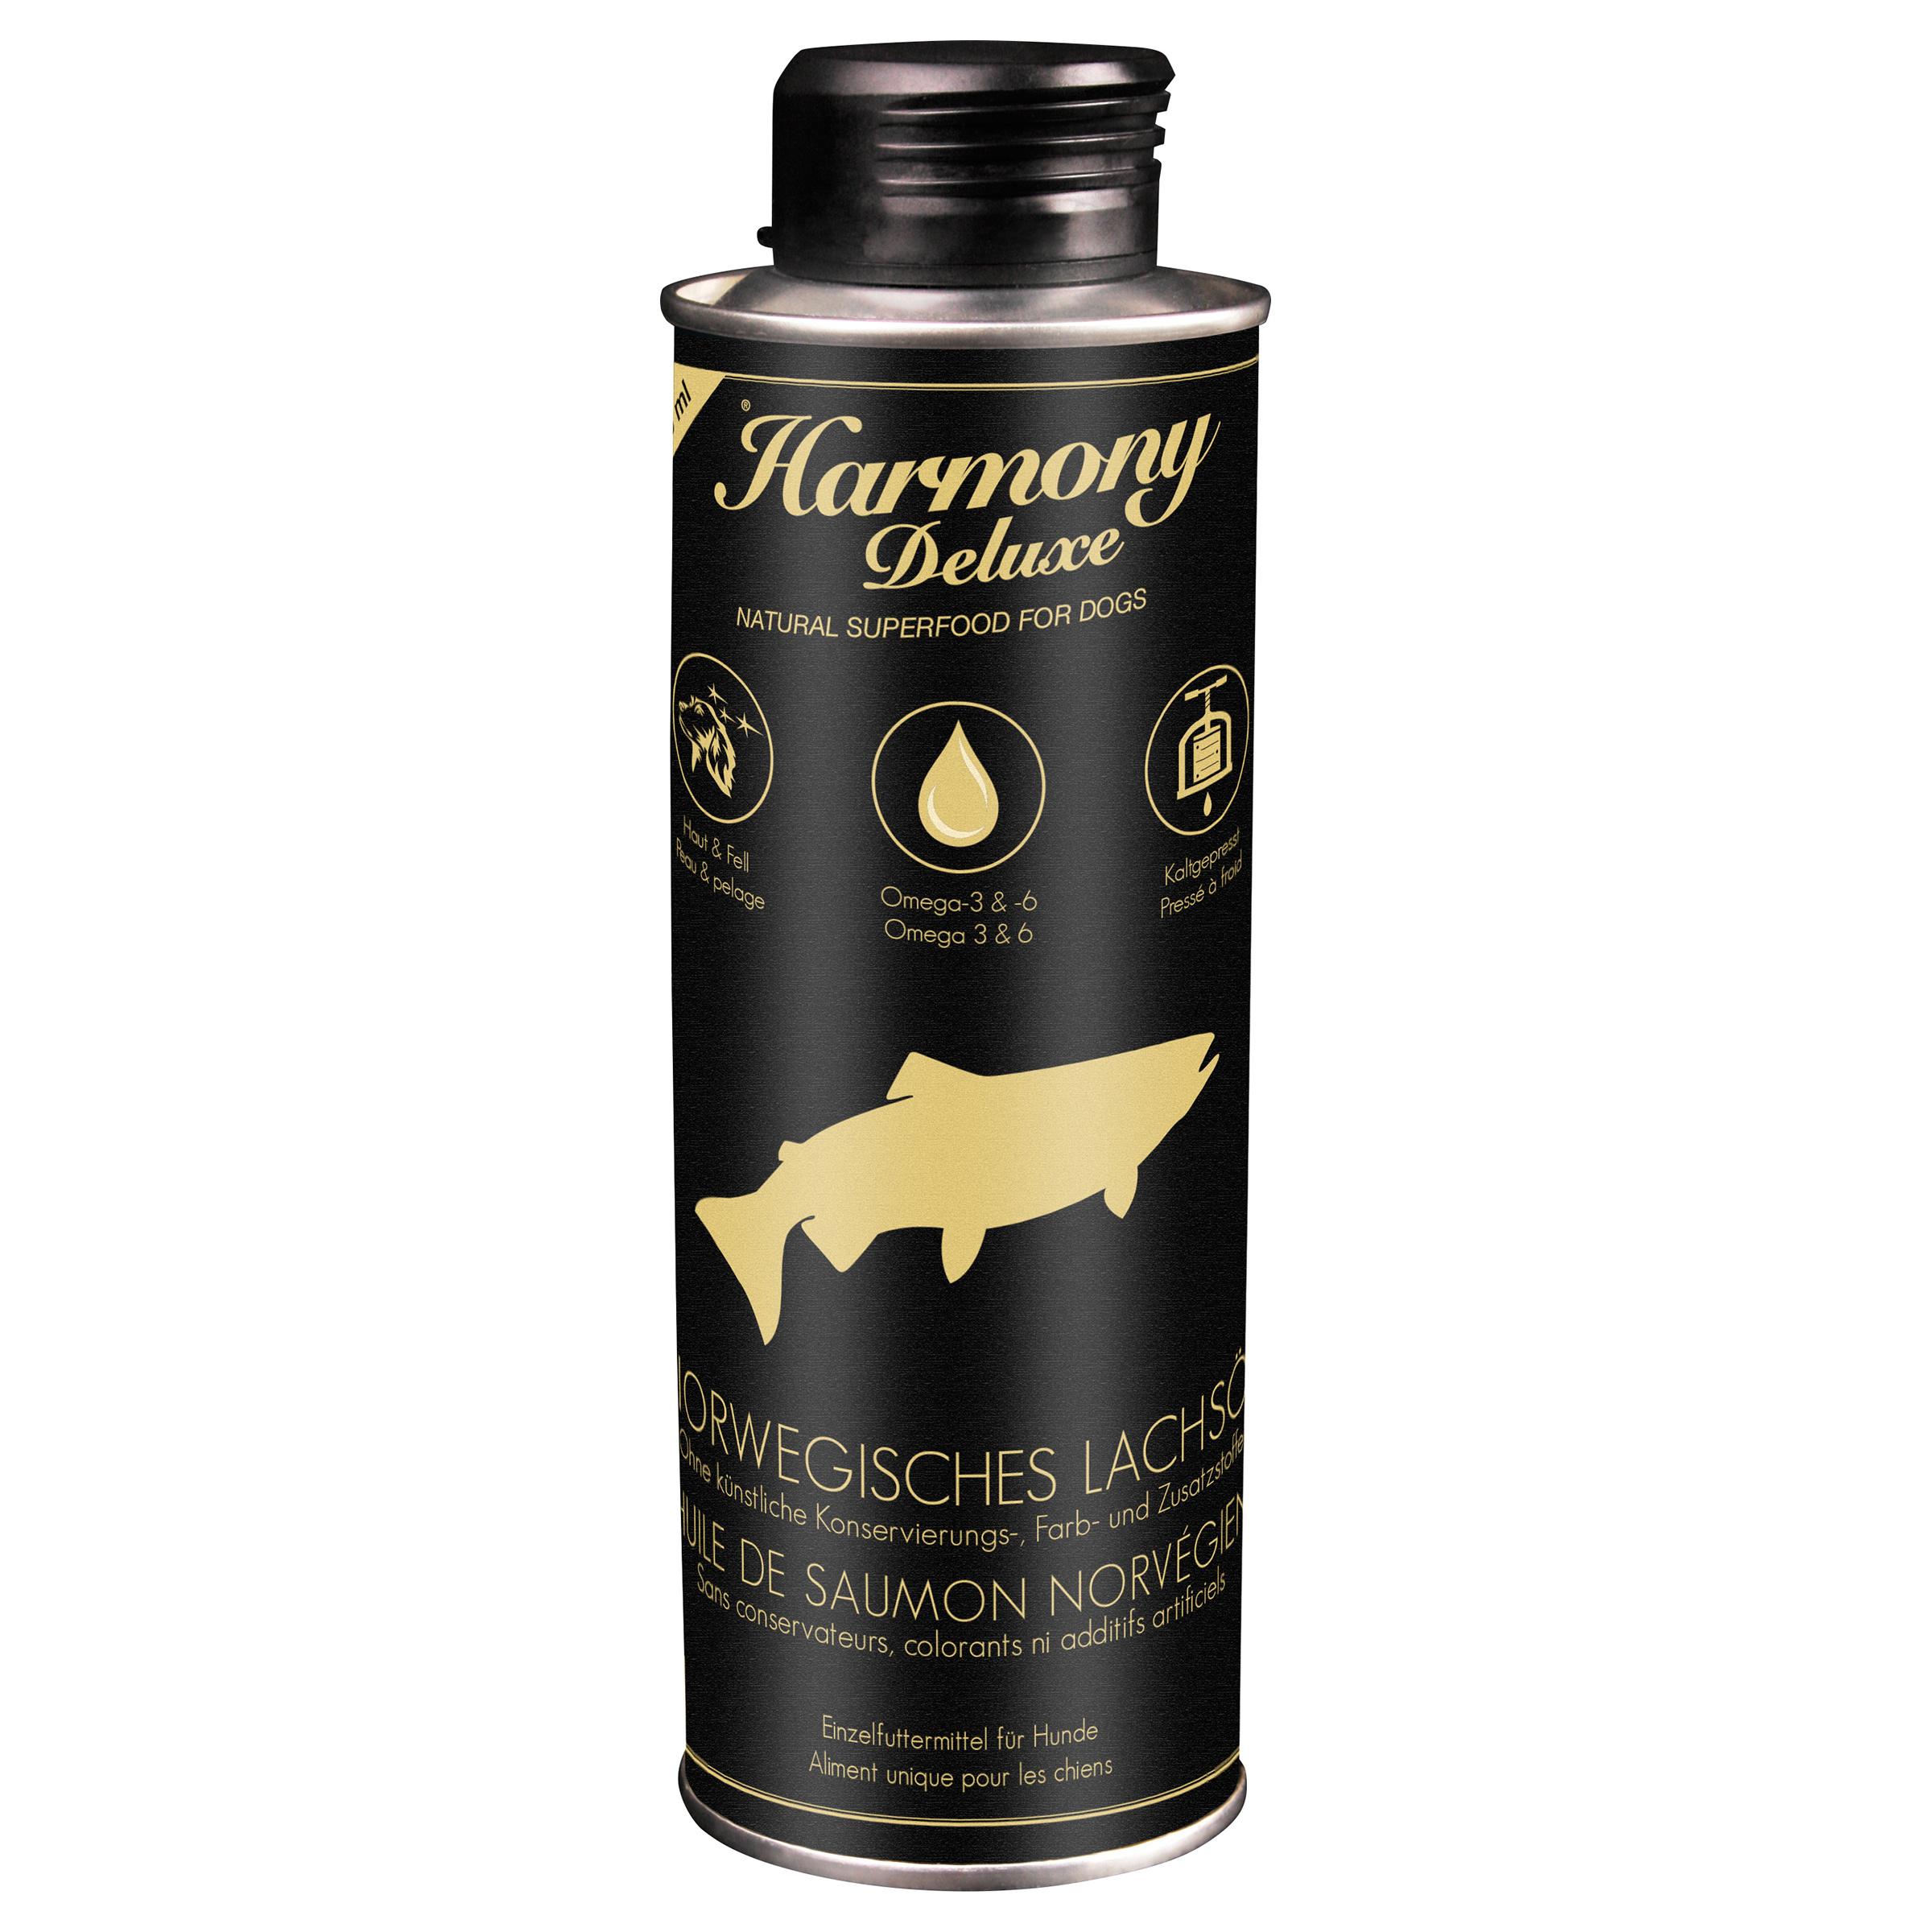 Harmony Dog Deluxe Norwegisches Lachsöl